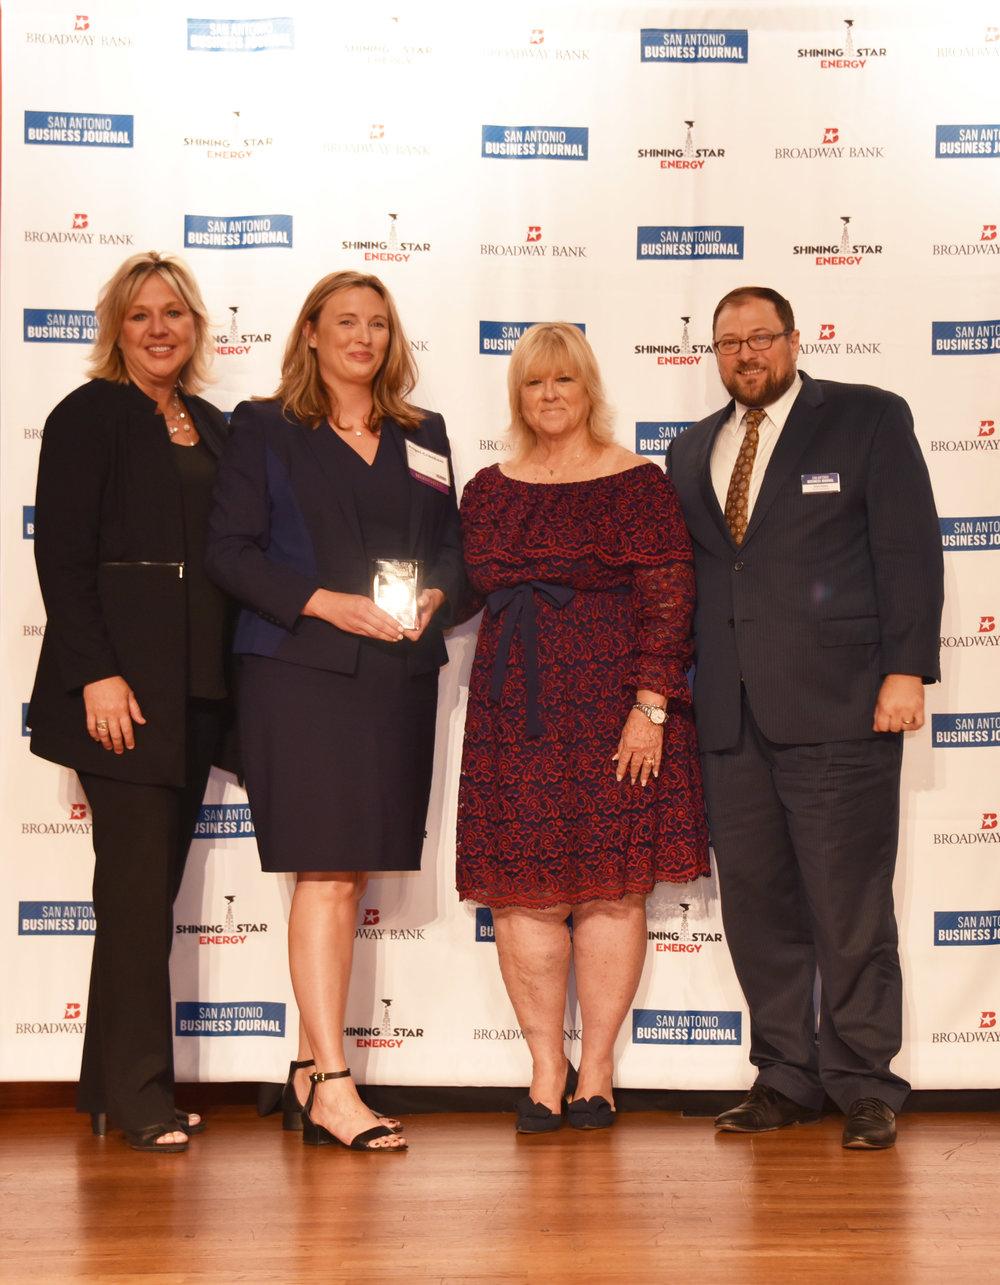 Angel Crockett receives her San Antonio Business Journal Women's Leadership Award as an Honoree.